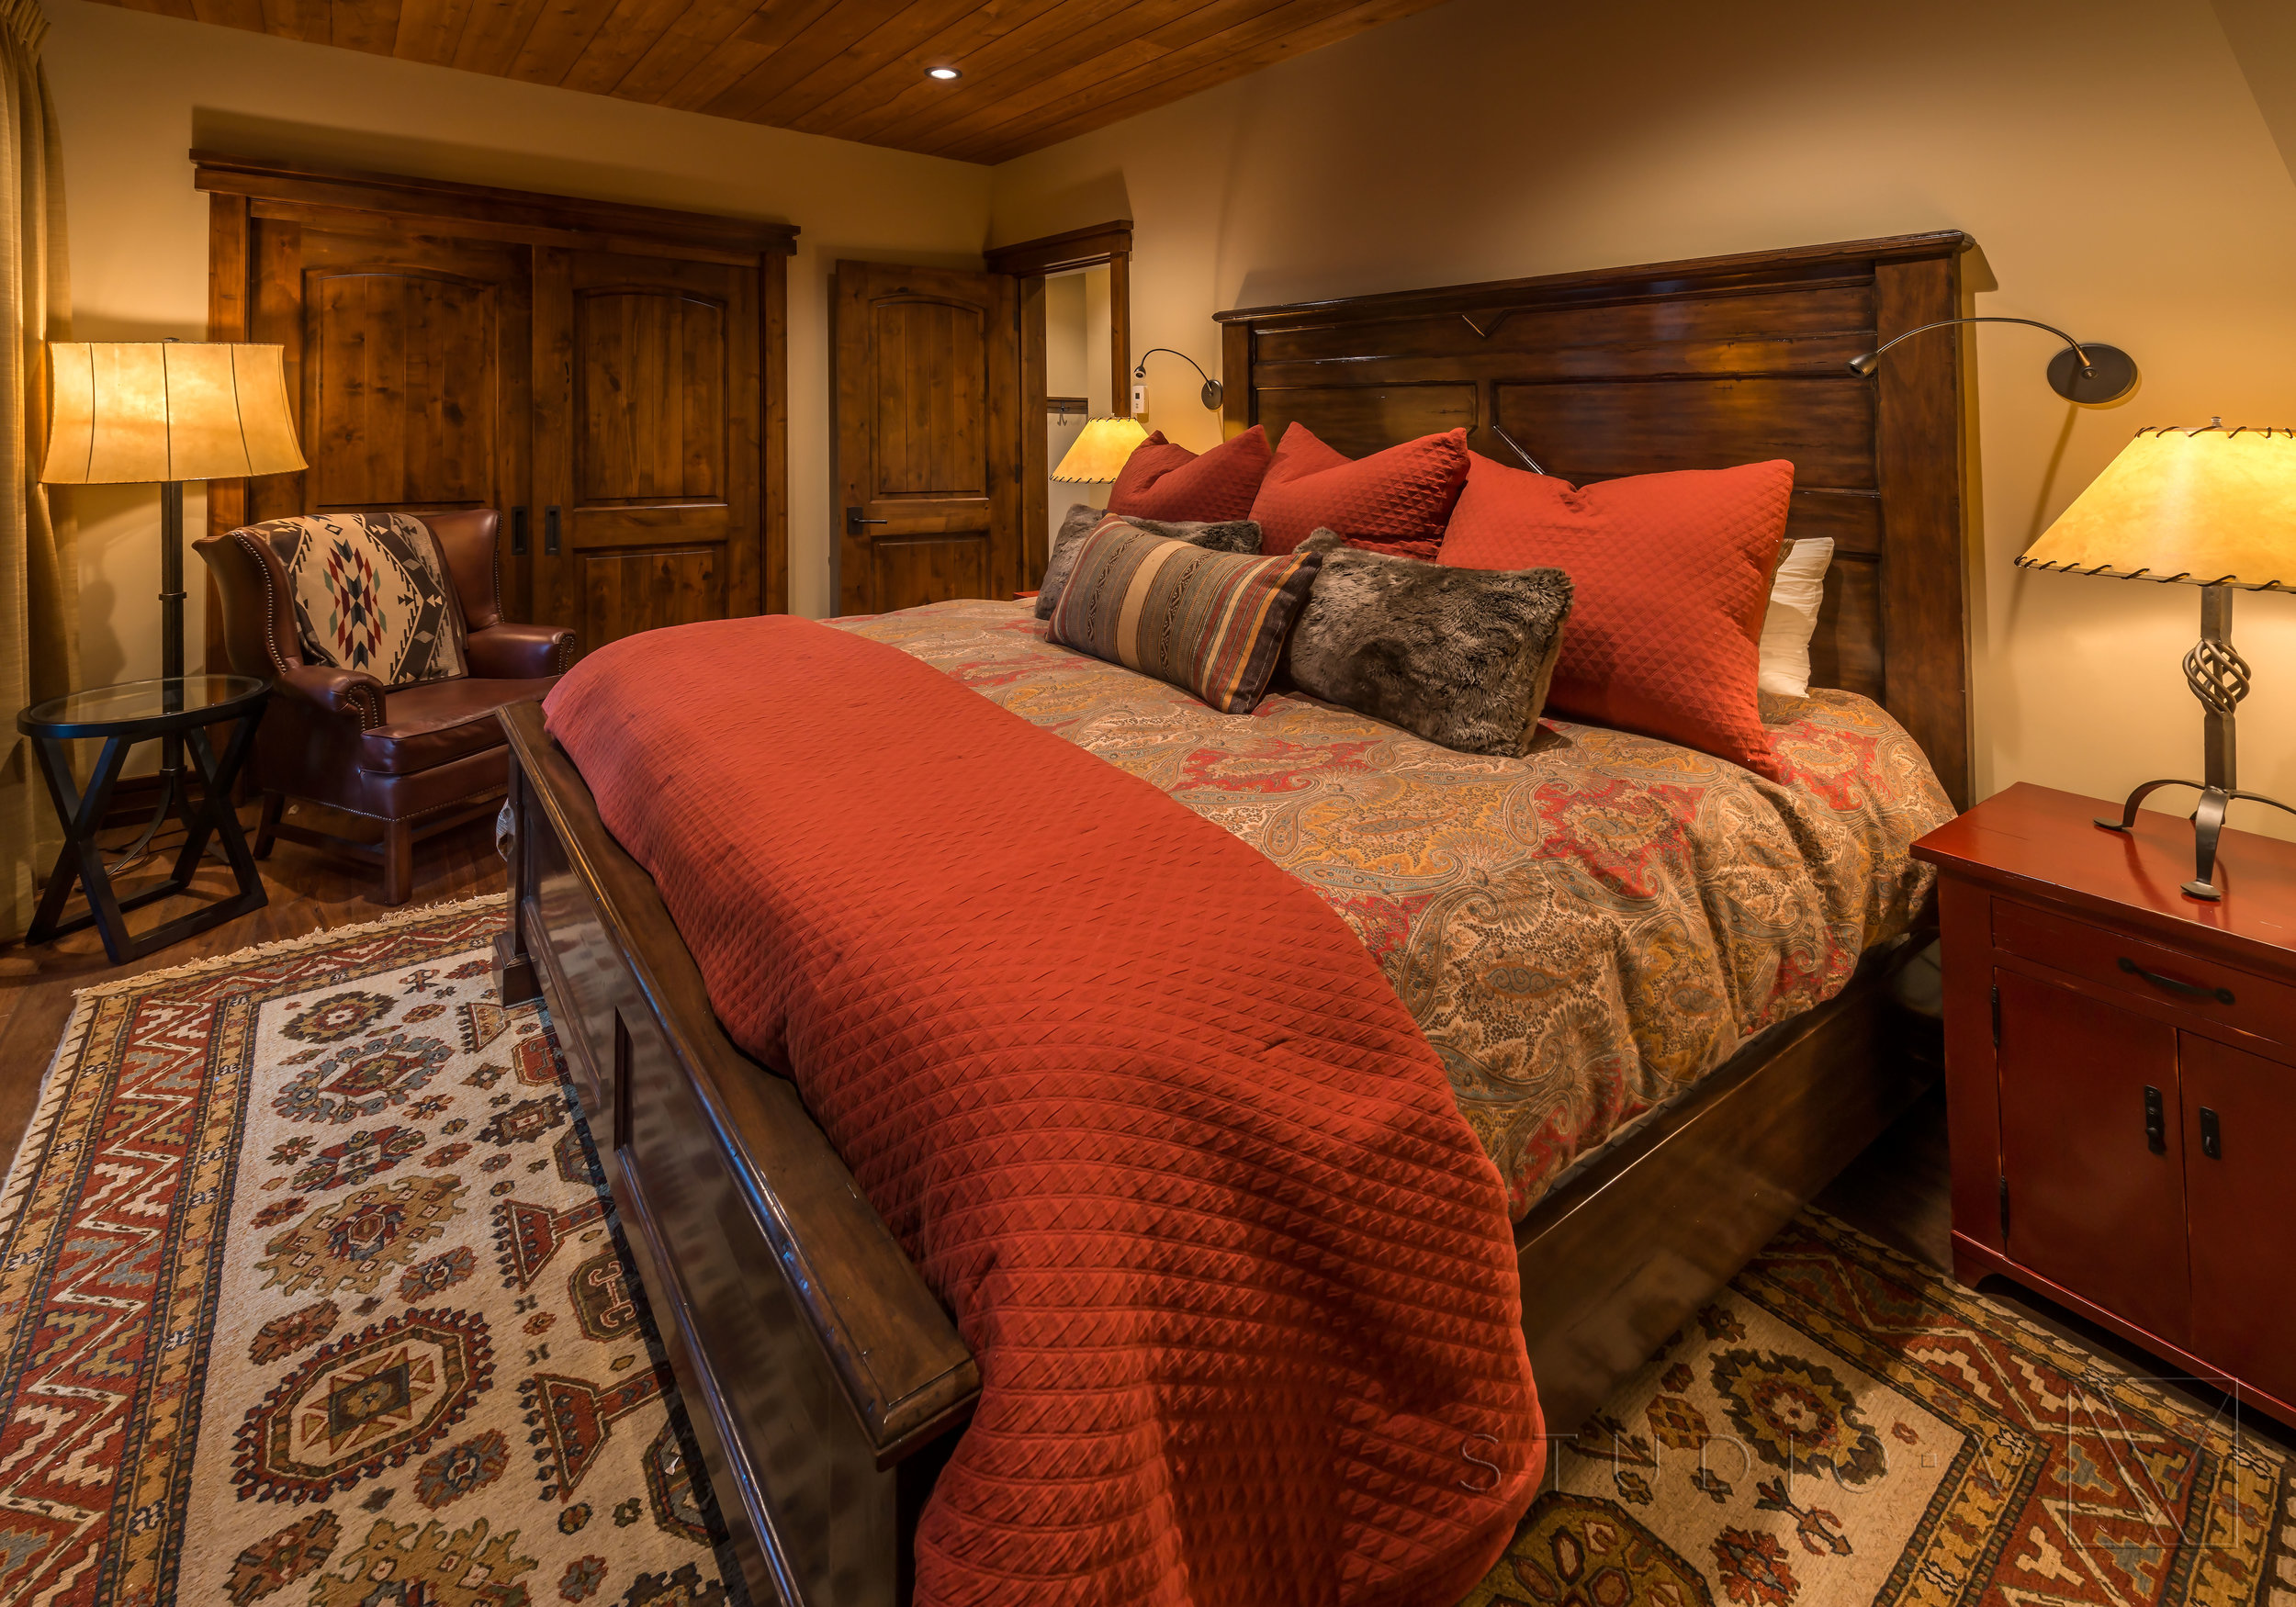 Lodge Cabin Tahoe Truckee Martis Camp CA California Traditional Studio V Interior Architecture Design Scottsdale Arizona AZ (22).jpg